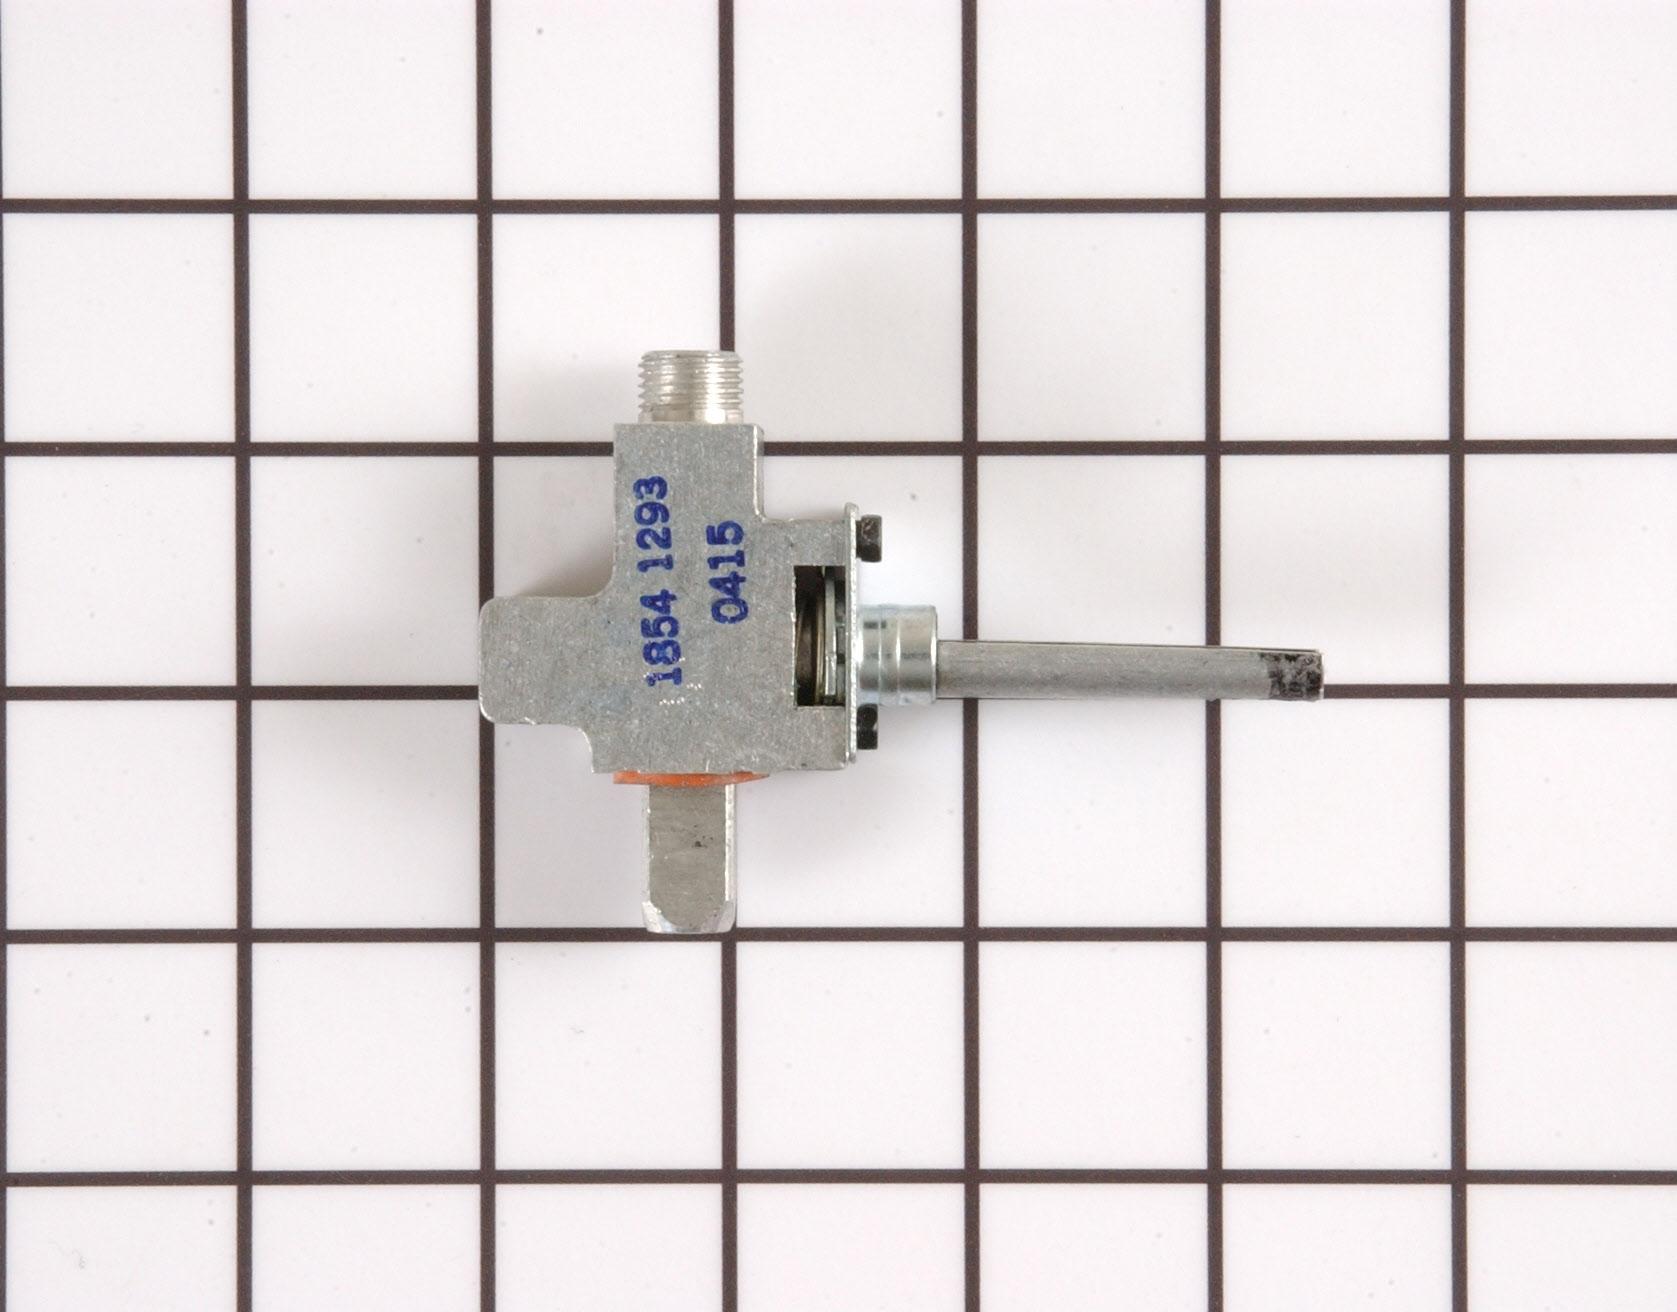 KitchenAid Range/Stove/Oven Part # WP3191293 - Surface Burner Valve